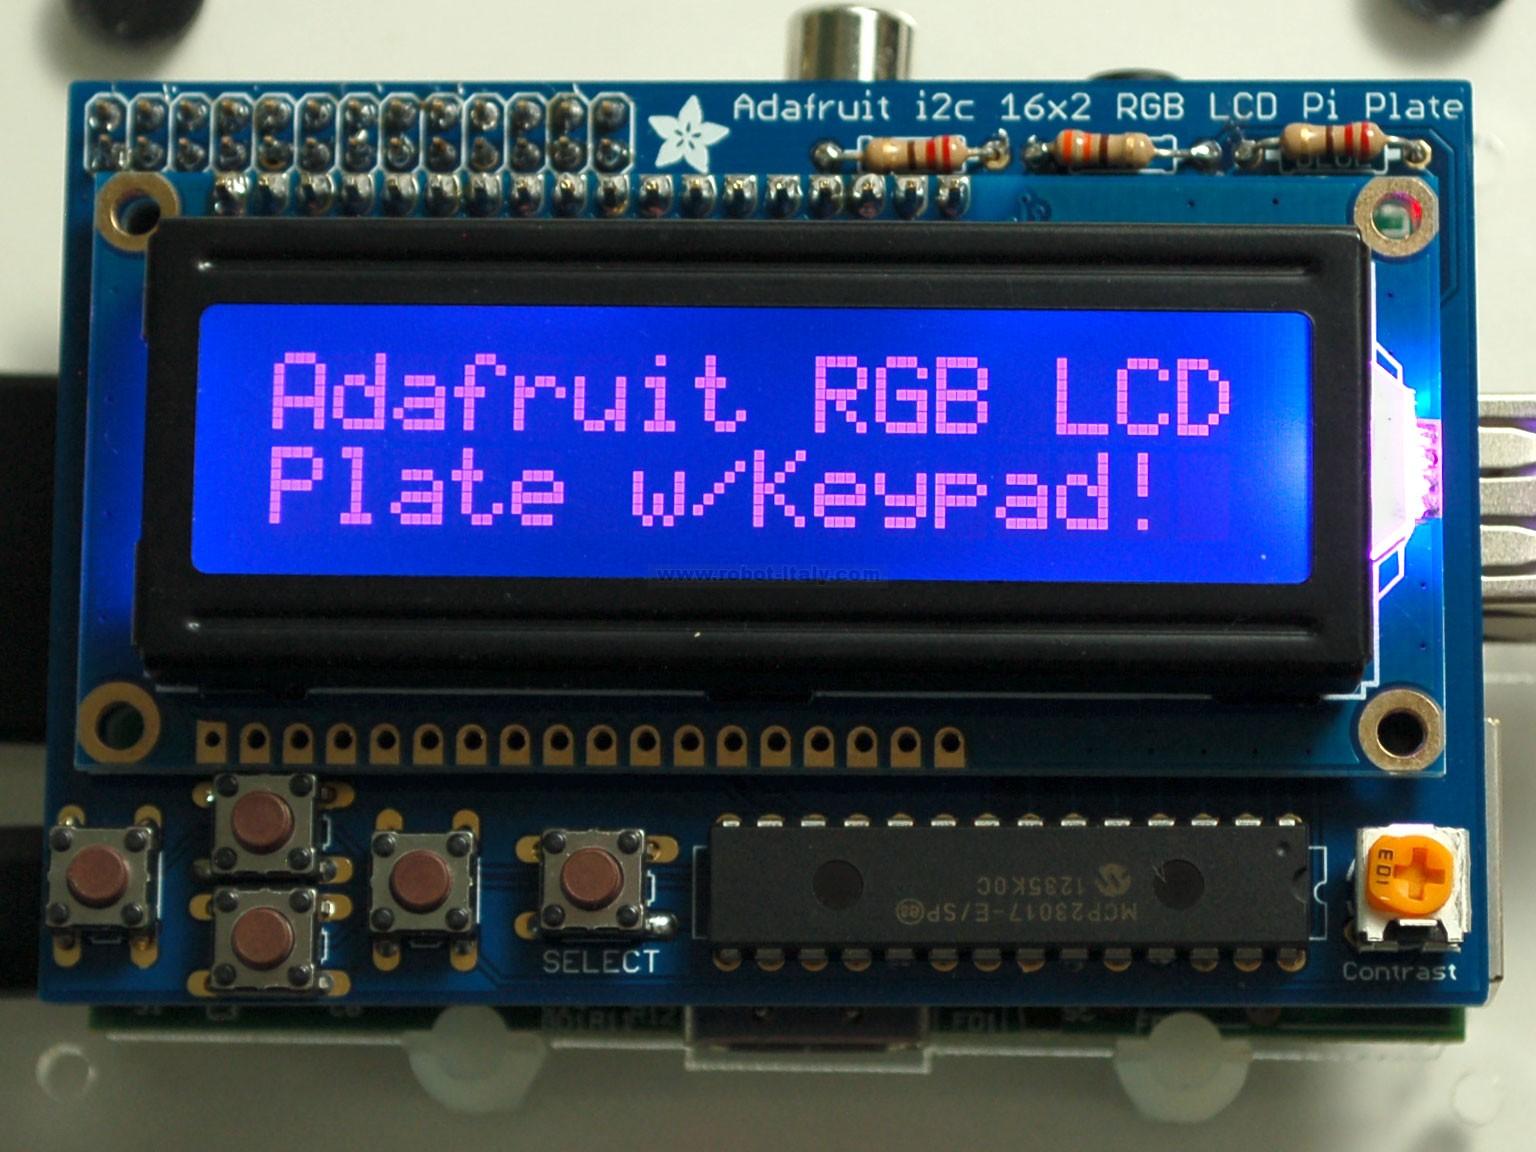 Adafruit RGB Negative 16x2 LCD+Keypad Kit for Raspberry Pi